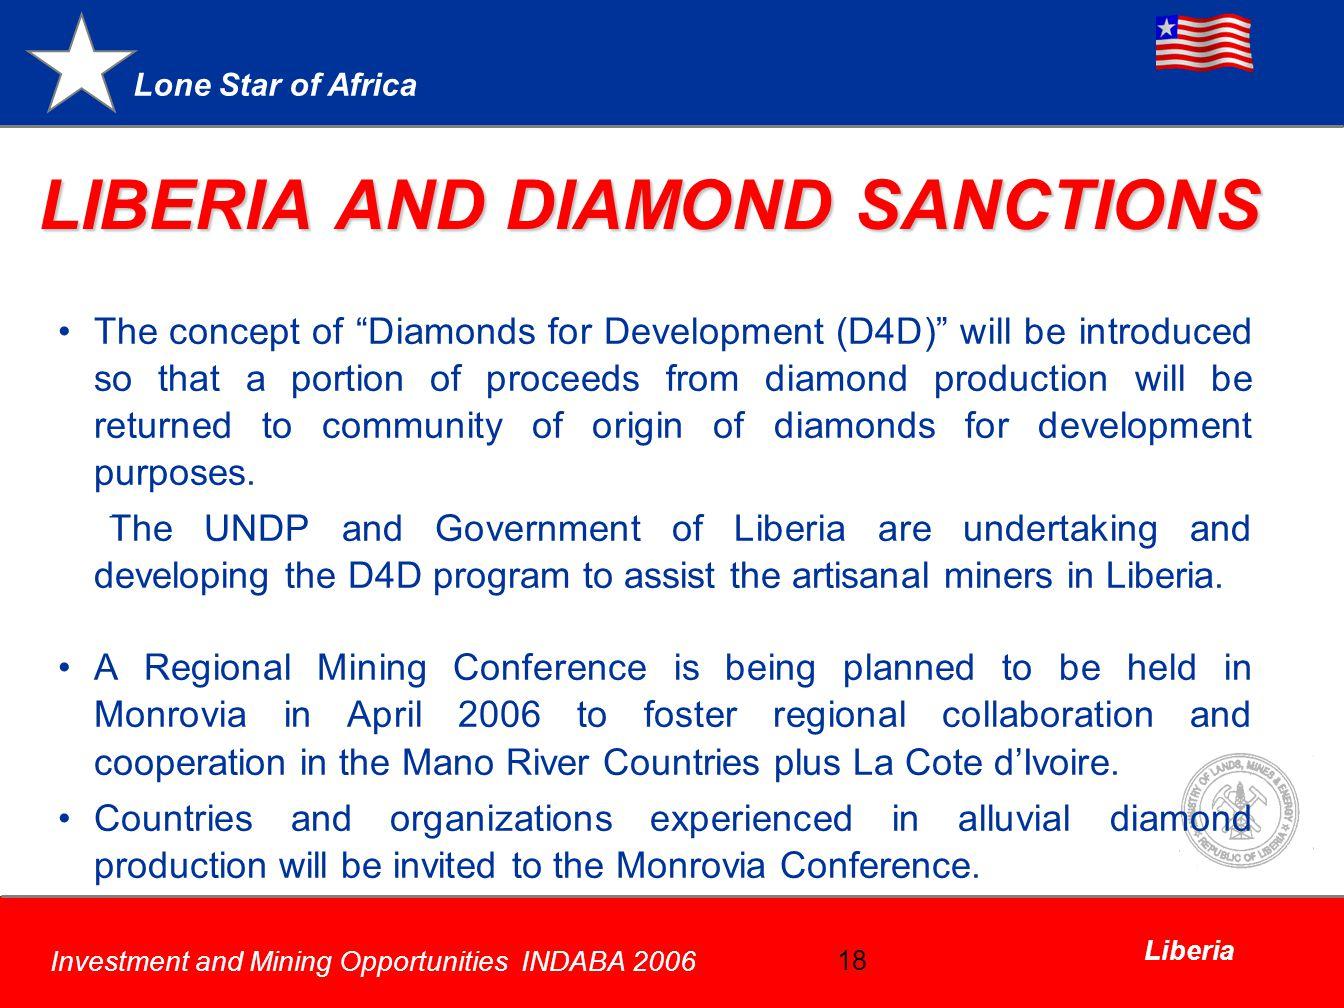 LIBERIA AND DIAMOND SANCTIONS